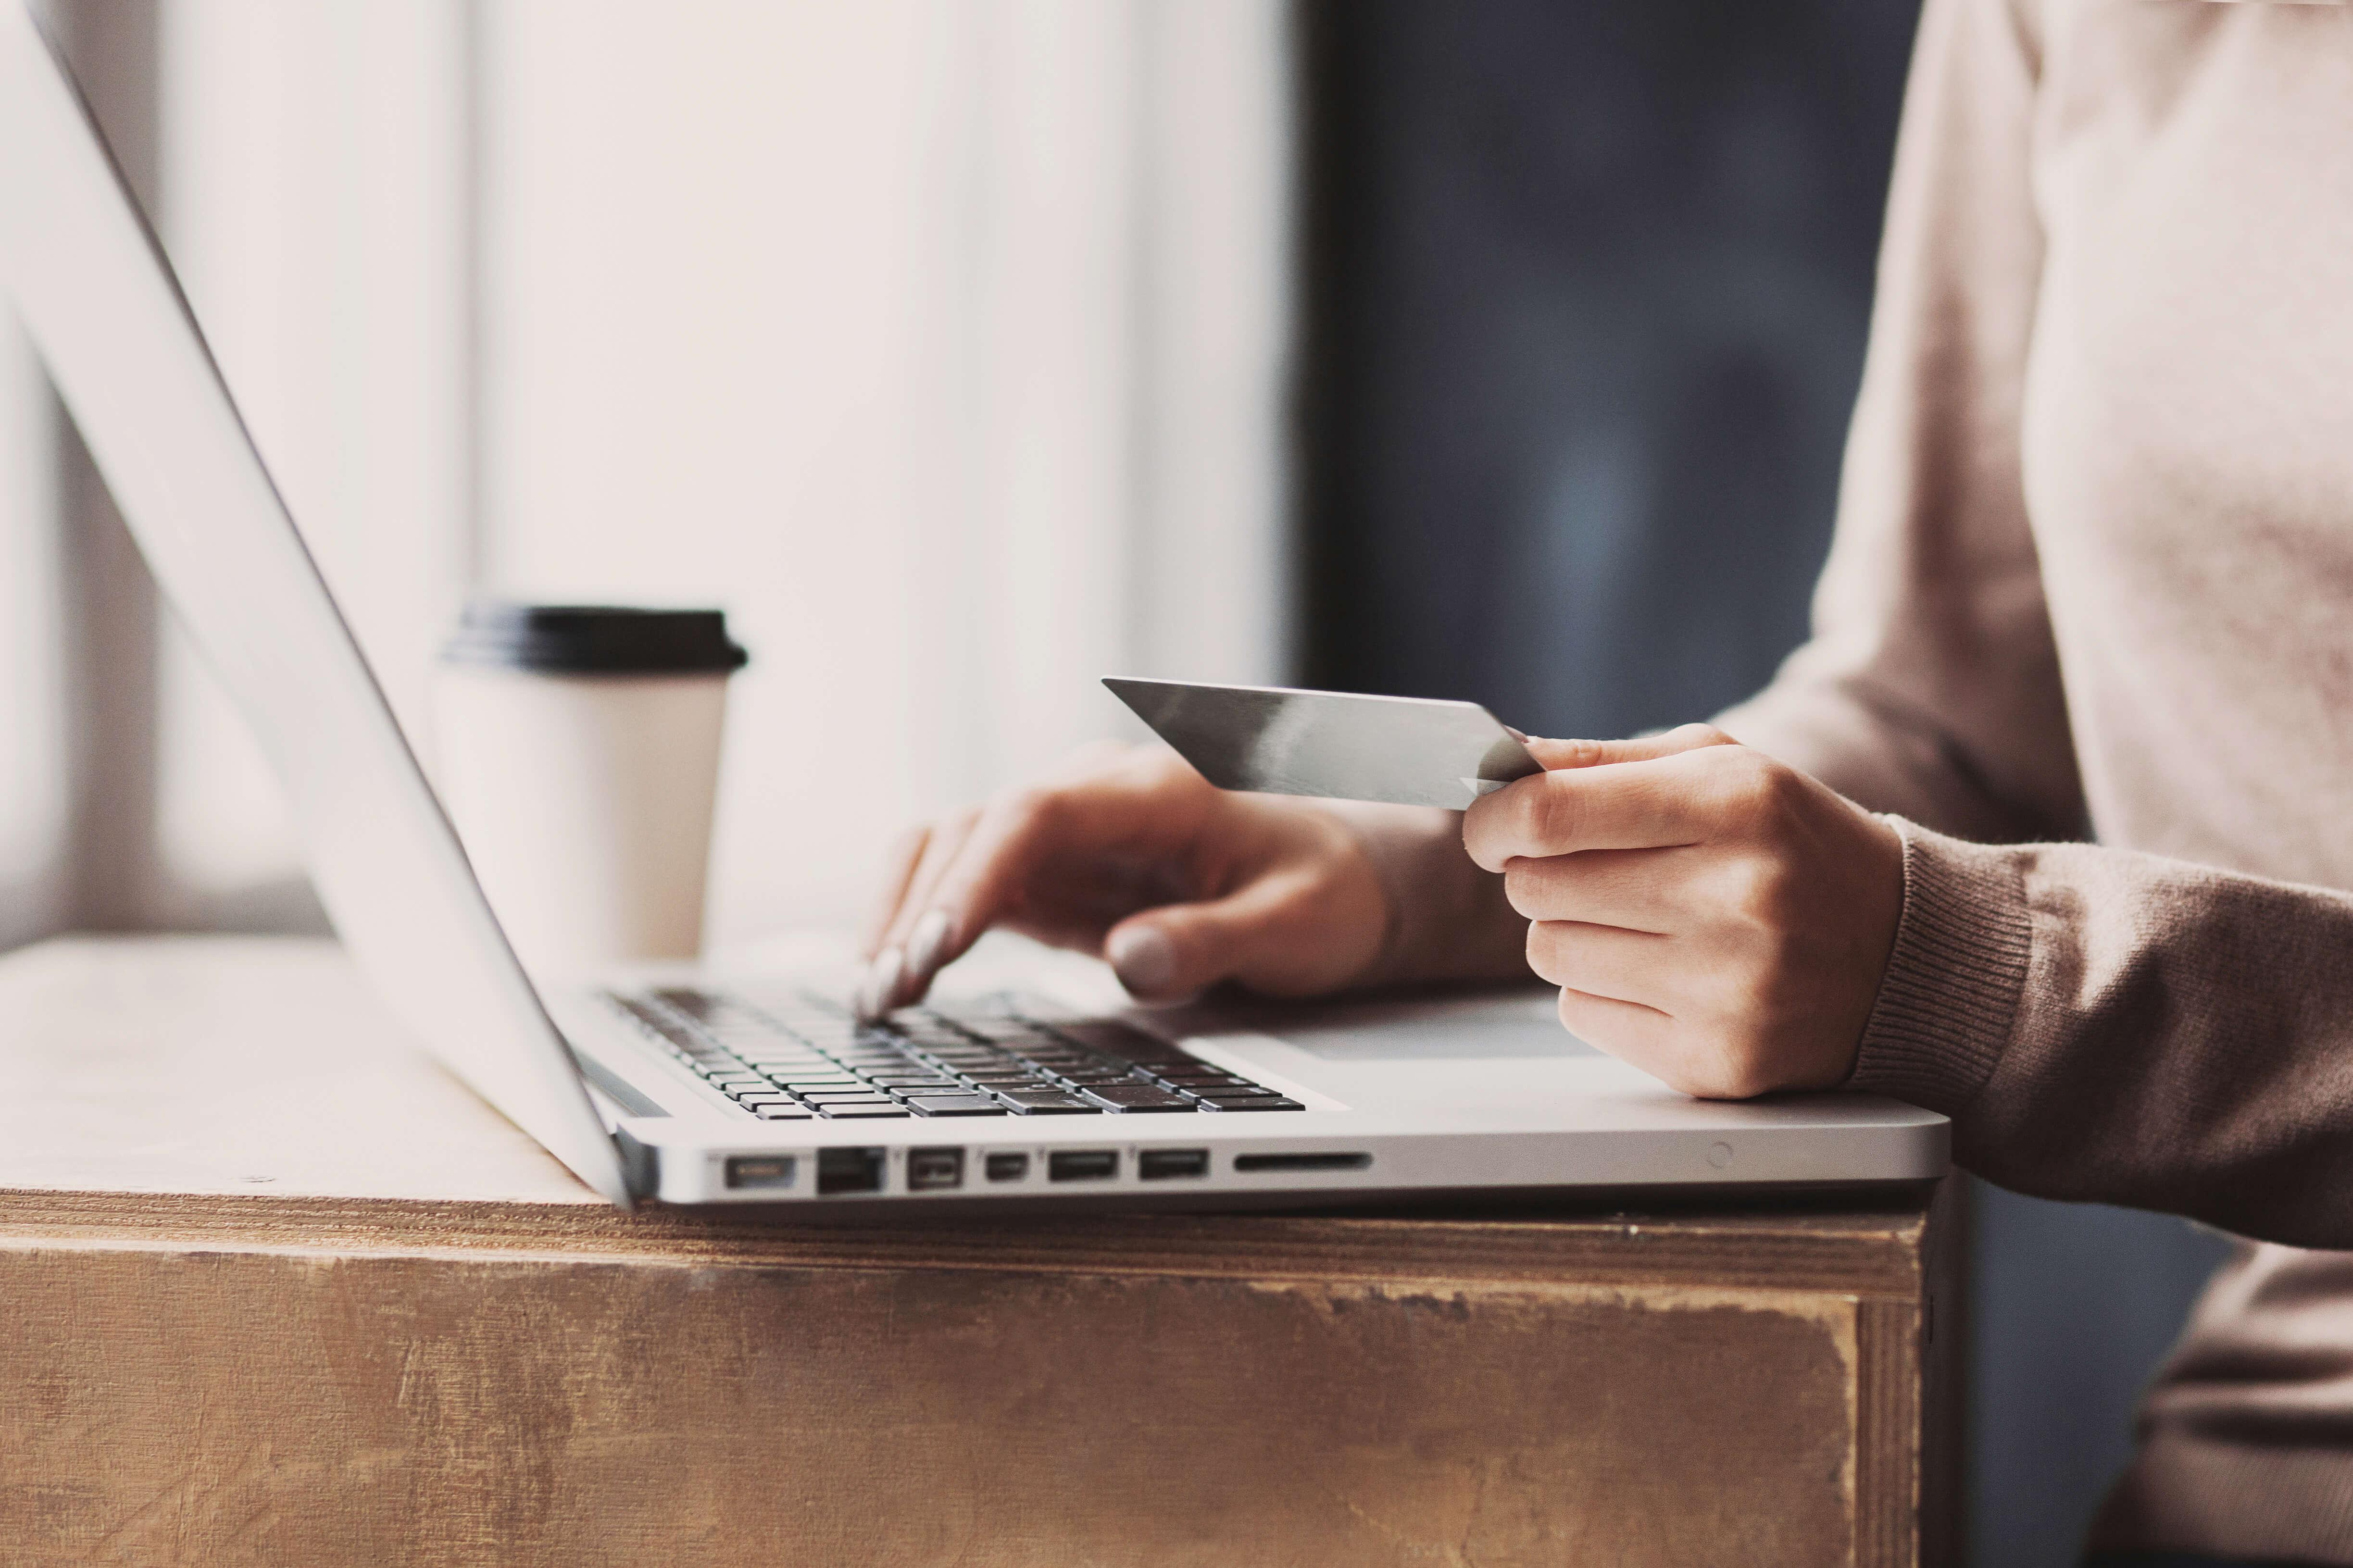 Online shopping, online banking